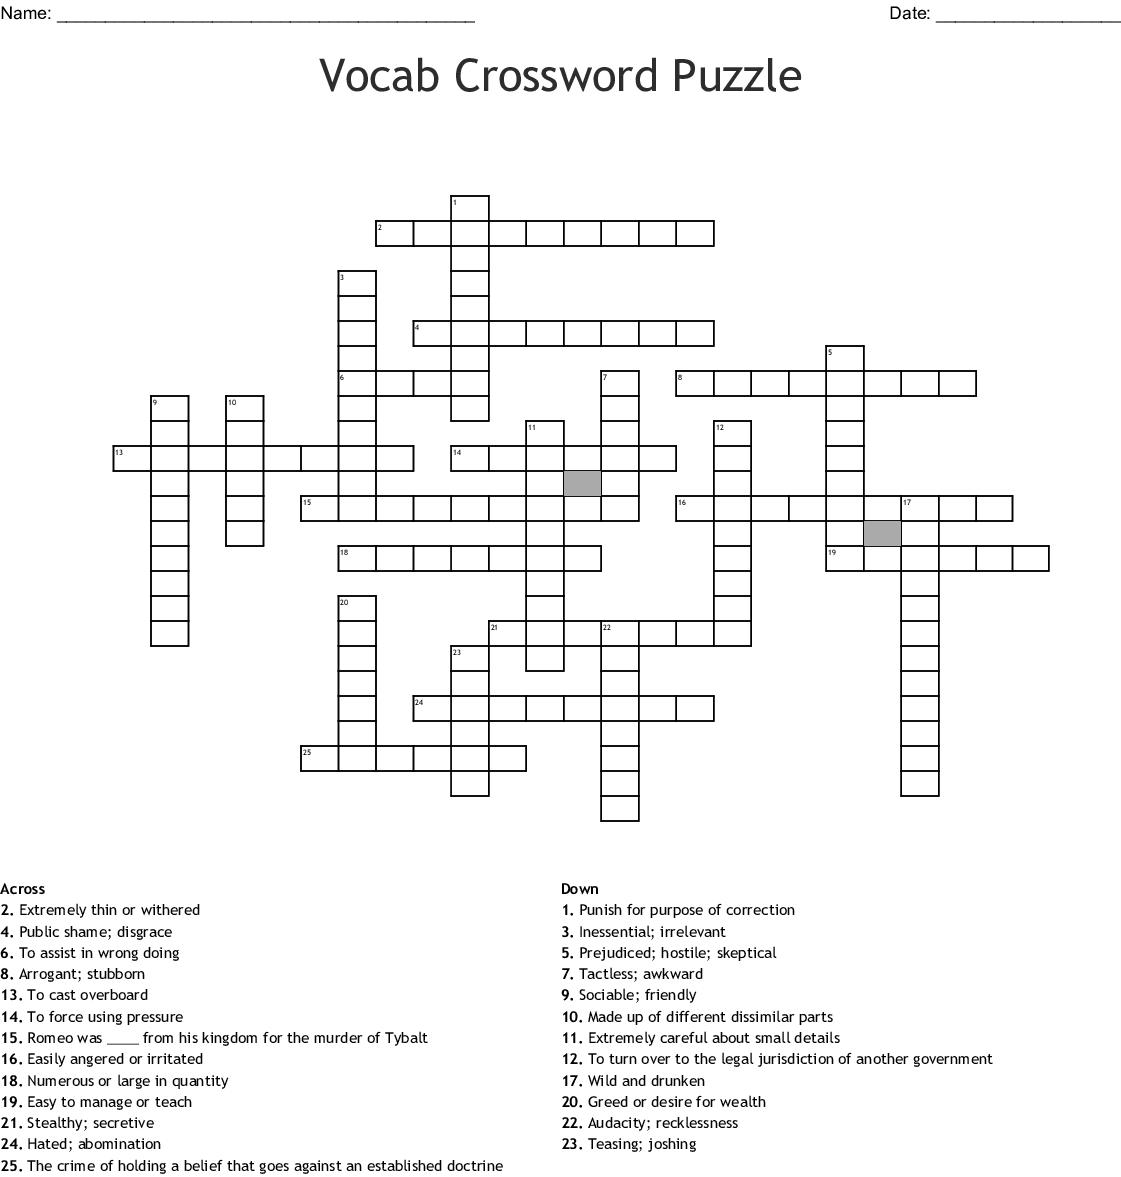 Vocab Crossword Puzzle Wordmint